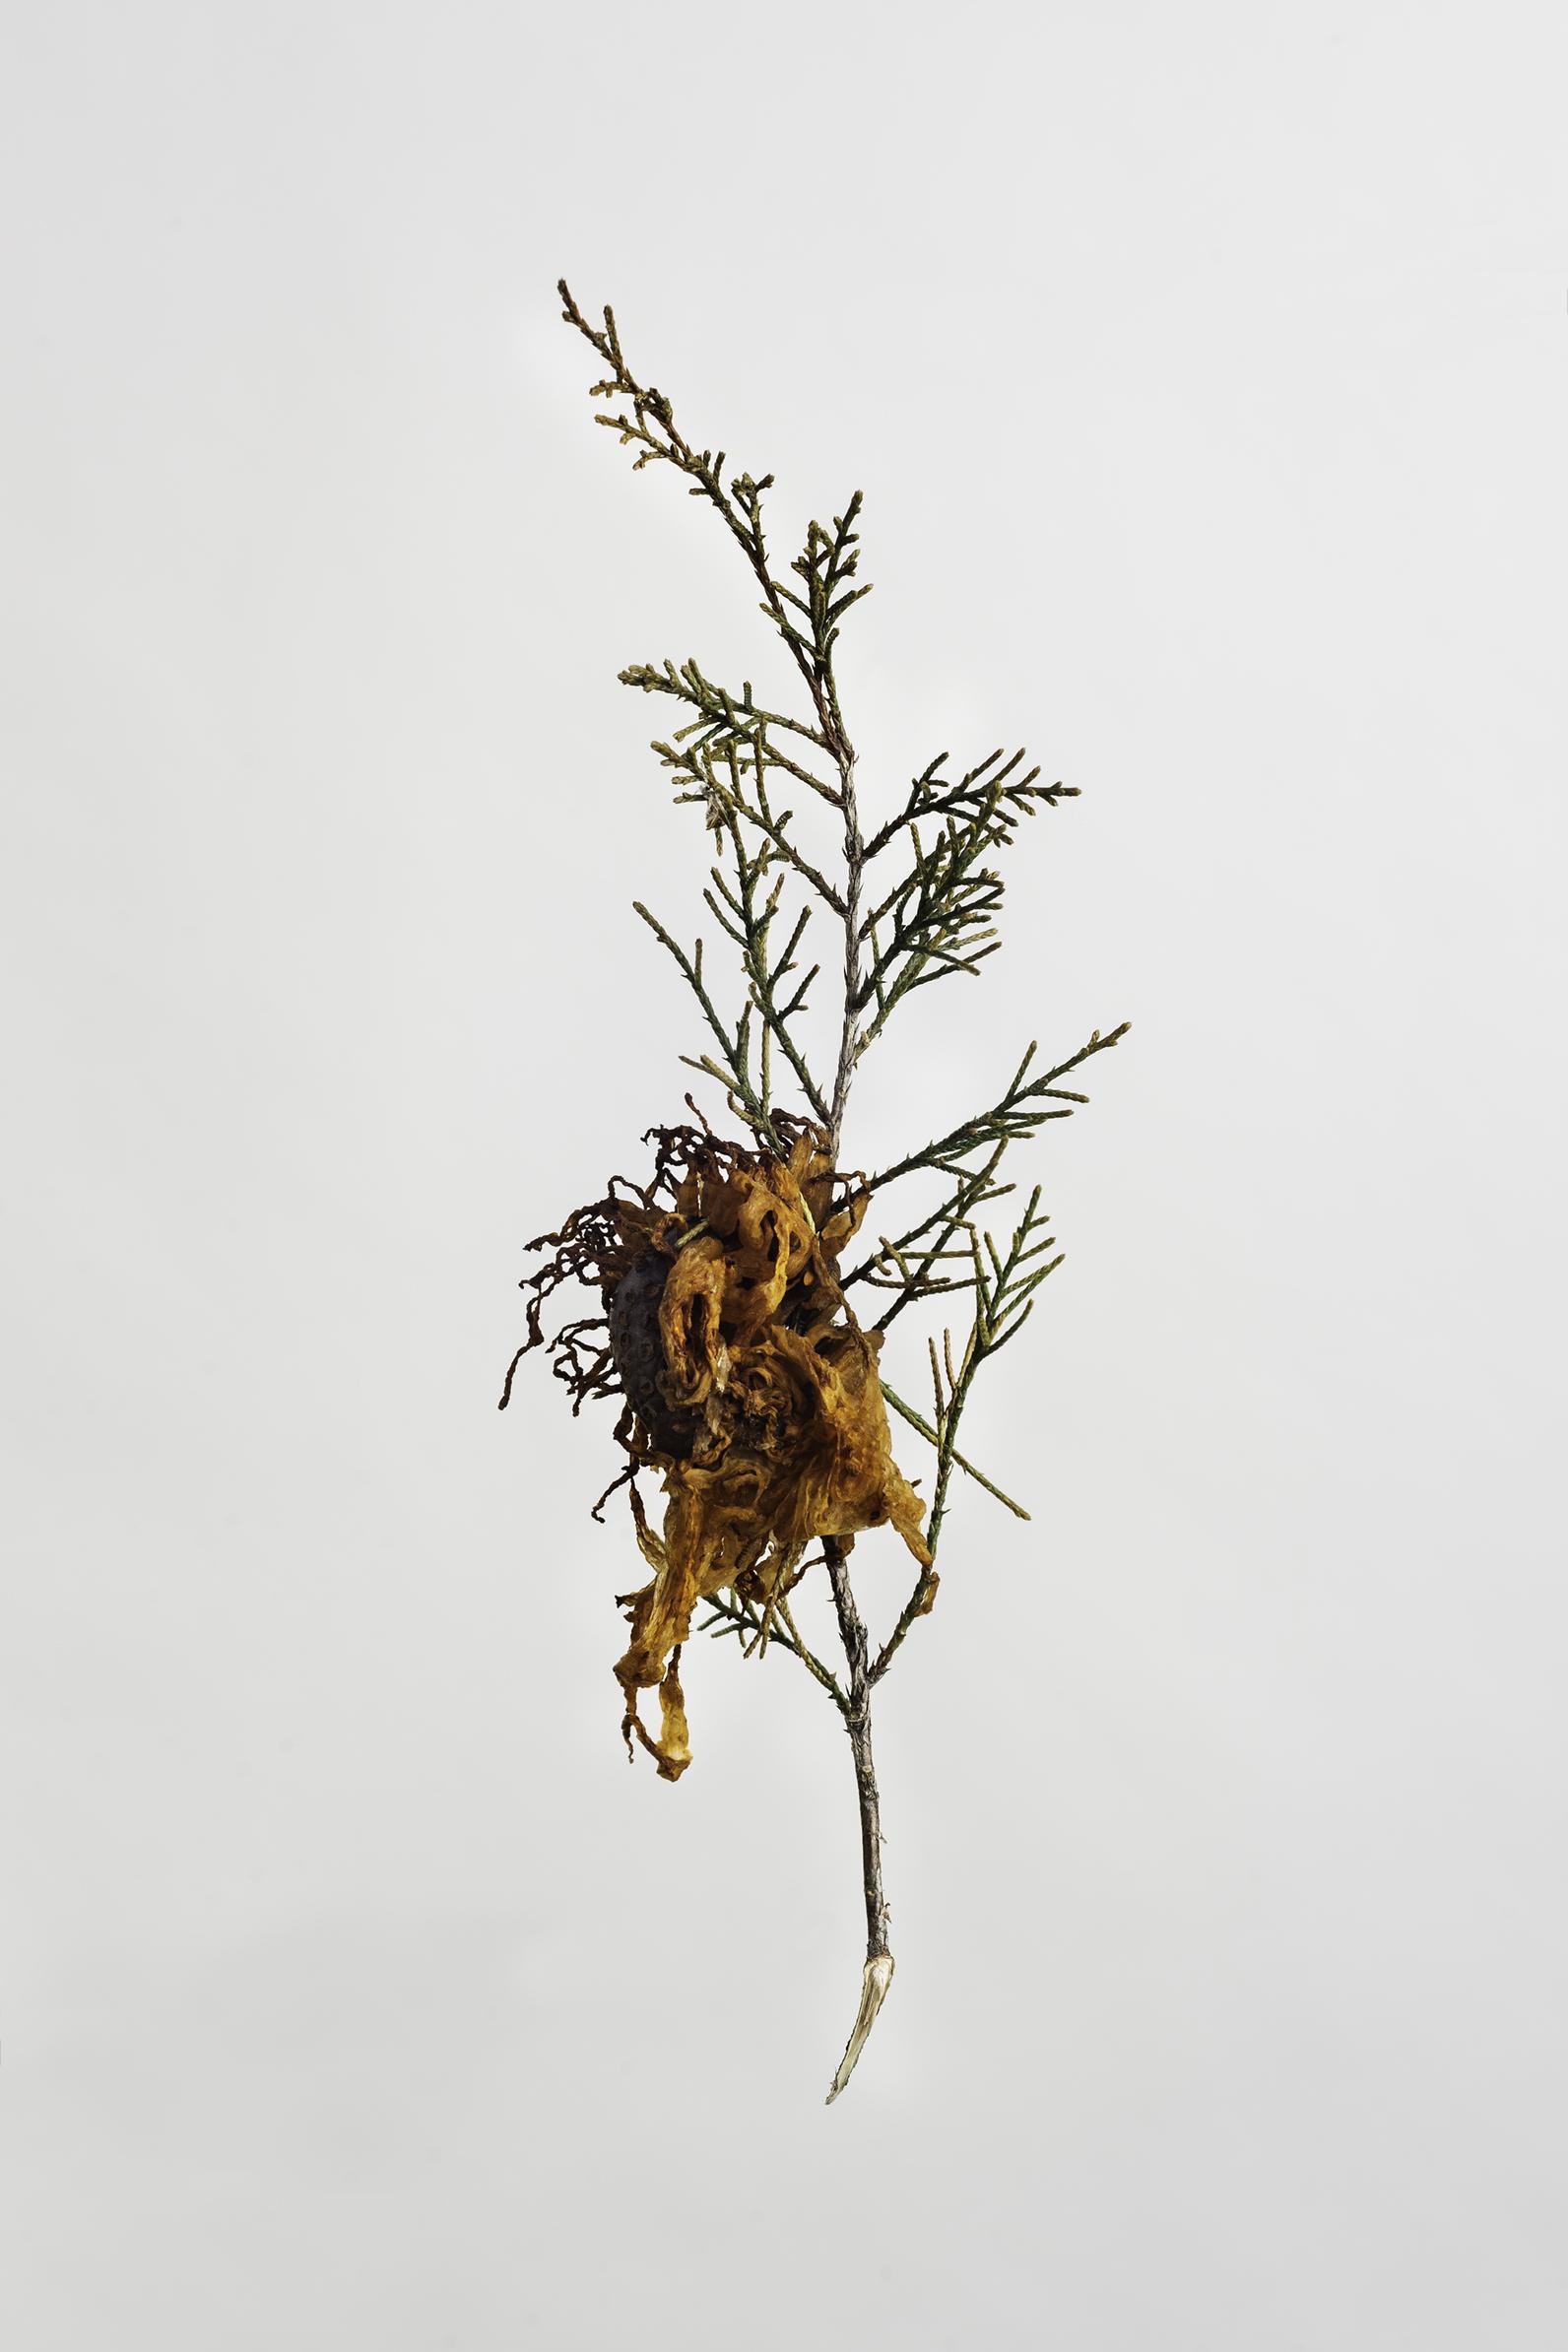 Gymnosporangium juniperi-virginianae - Cedar Apple Rust